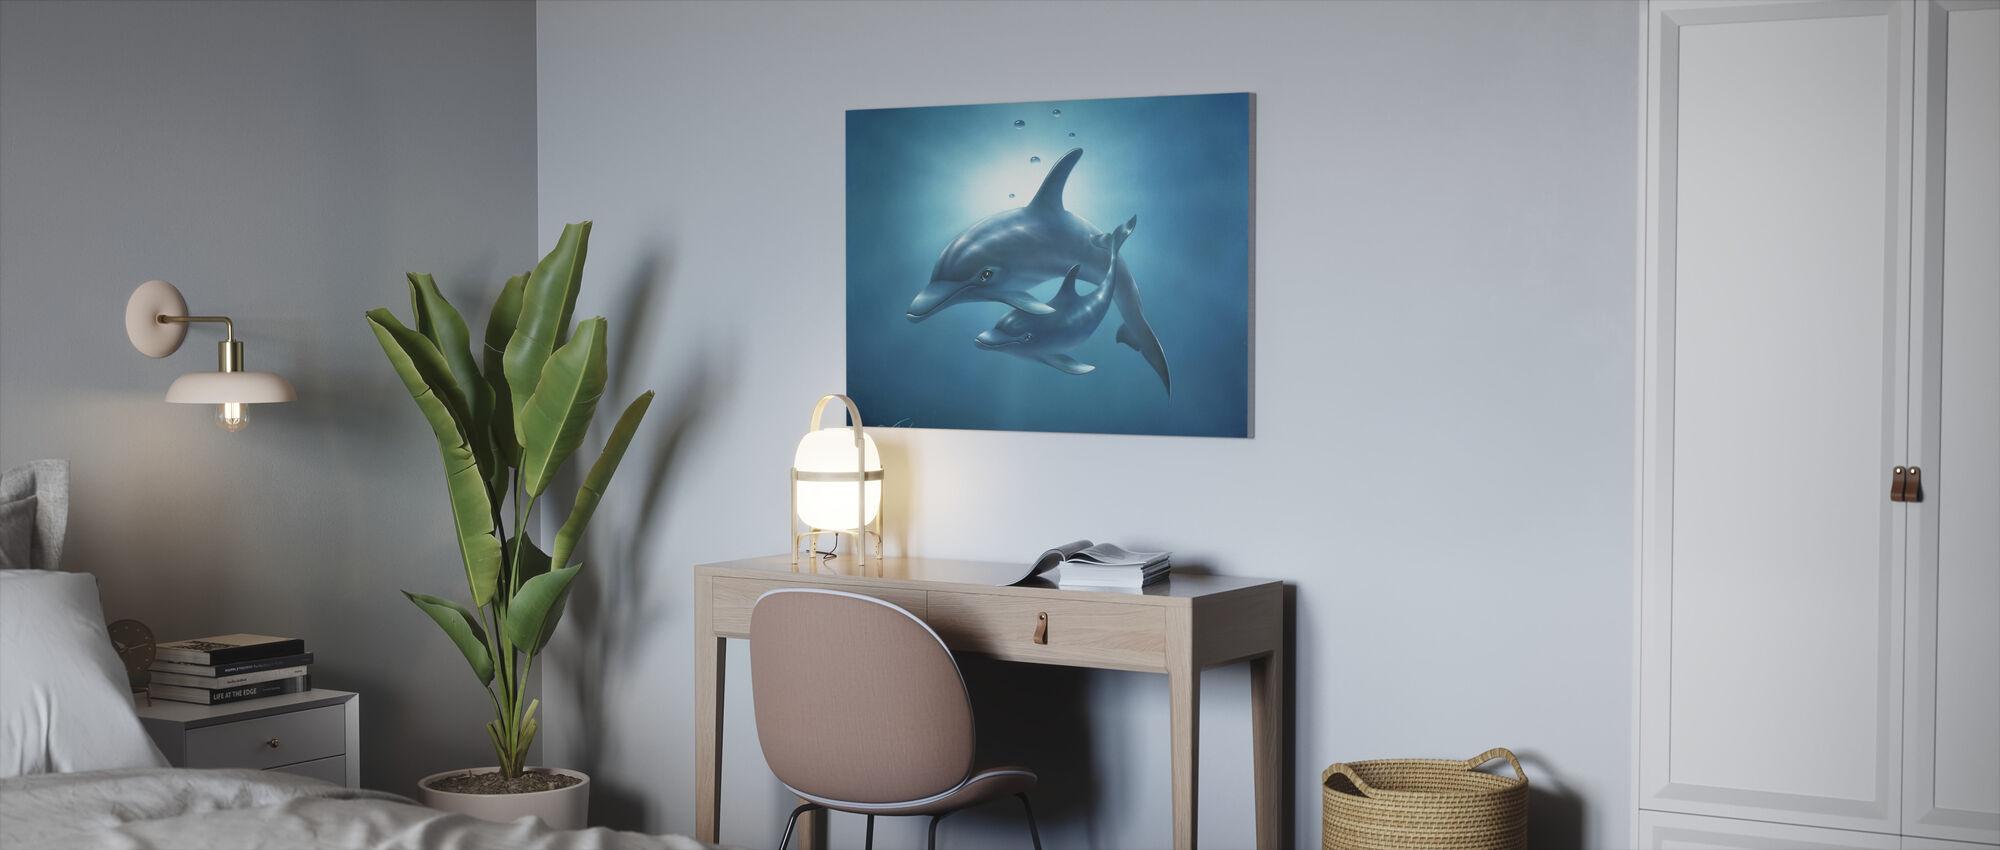 Love - Canvas print - Office